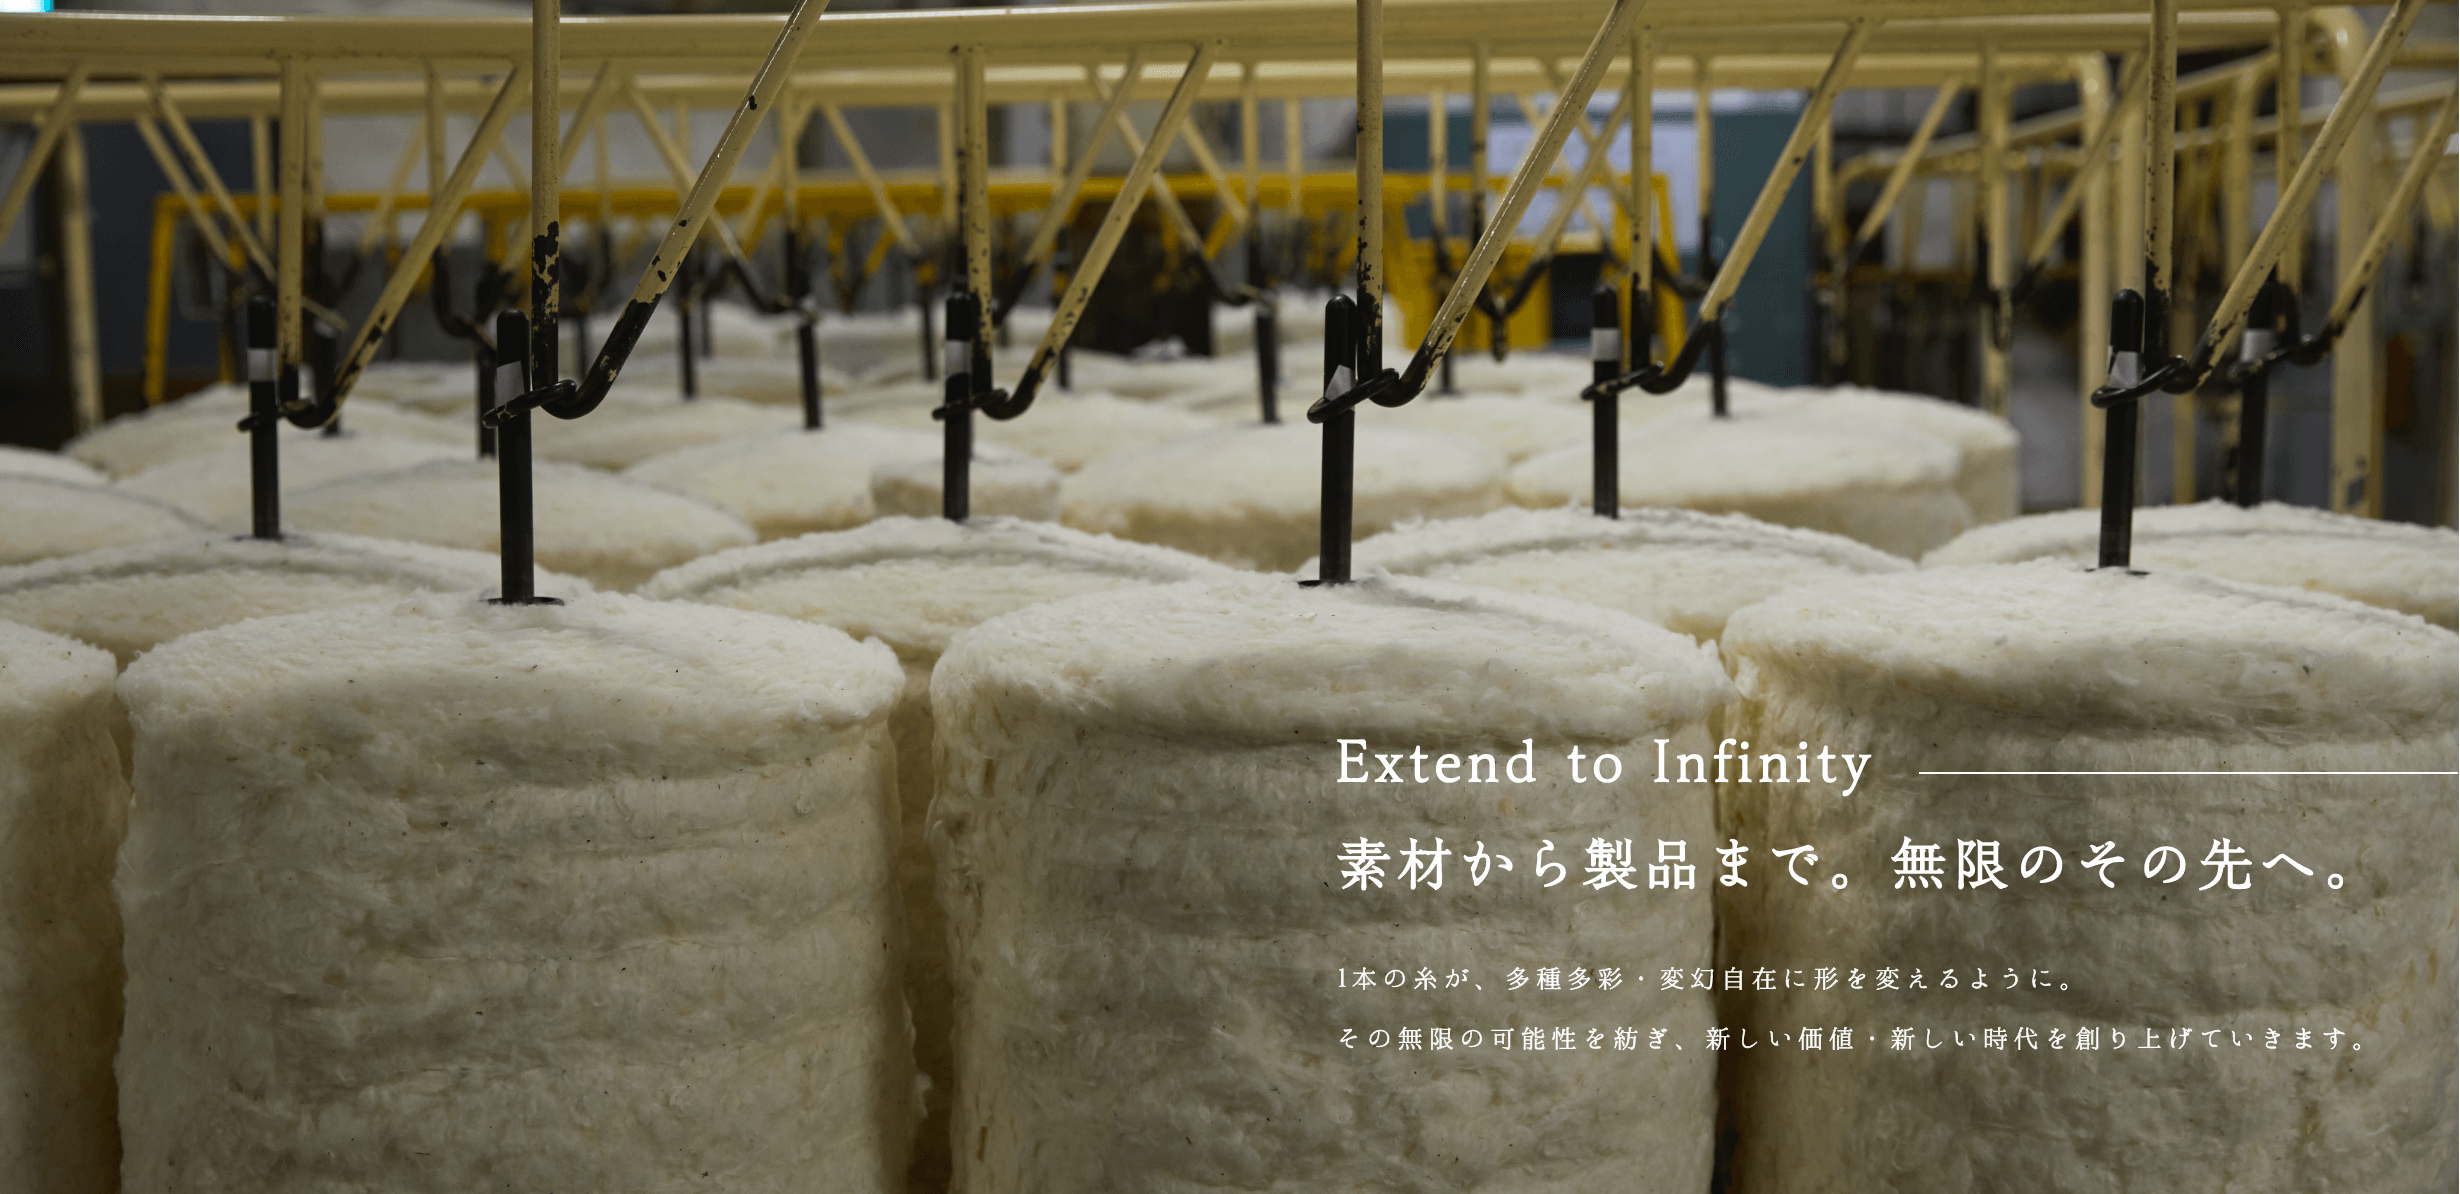 Extend to Infinity 素材から製品まで。無限のその先へ。 1本の糸が、多種多彩・変幻自在に形を変えるように。その無限の可能性を紡ぎ、新しい価値・新しい時代を創り上げていきます。